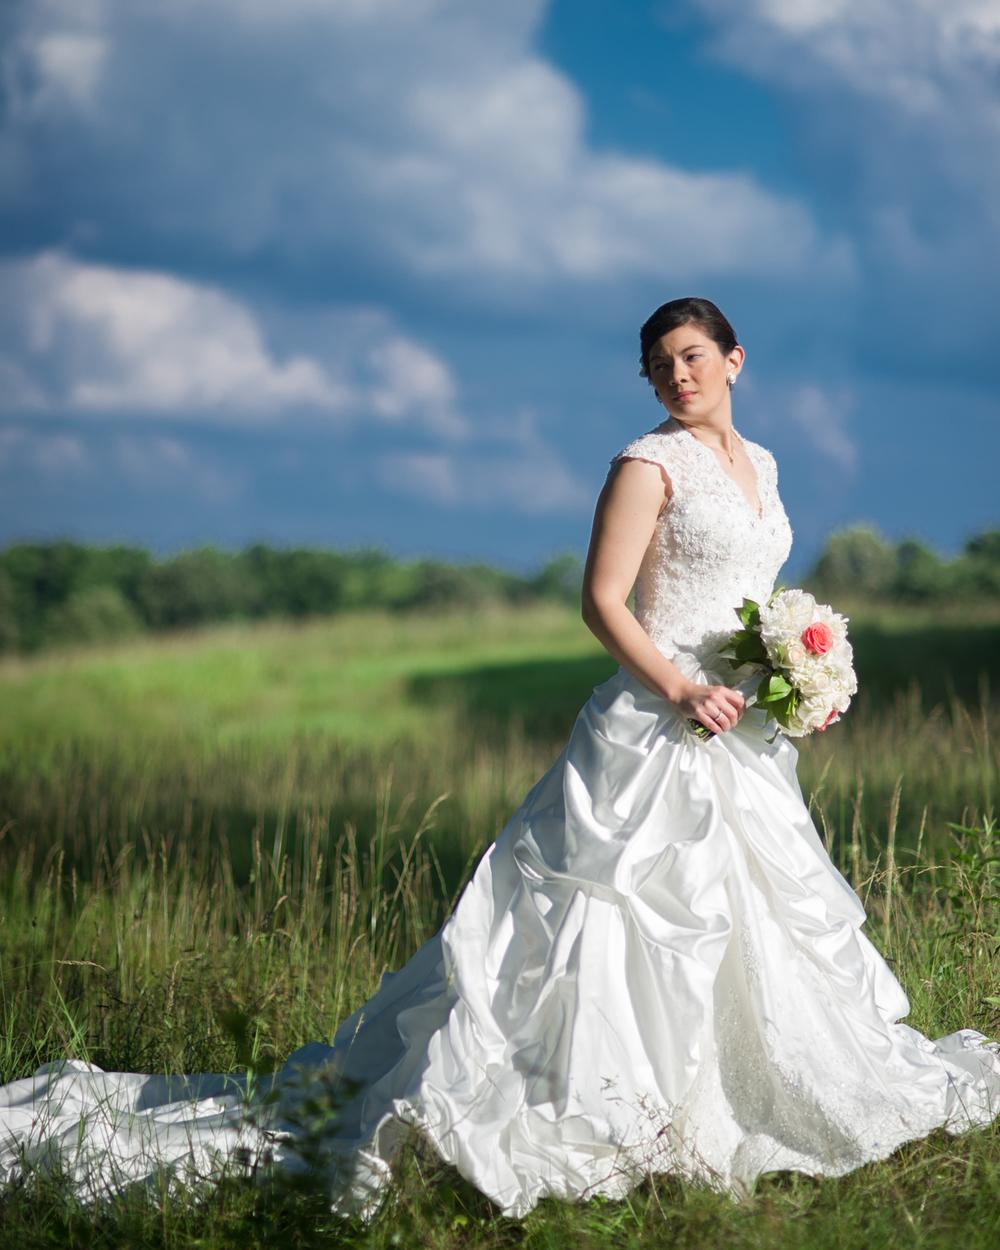 creationstudios-memphis-wedding-photography-0031-madisondanielbridegroomfull-89.jpg